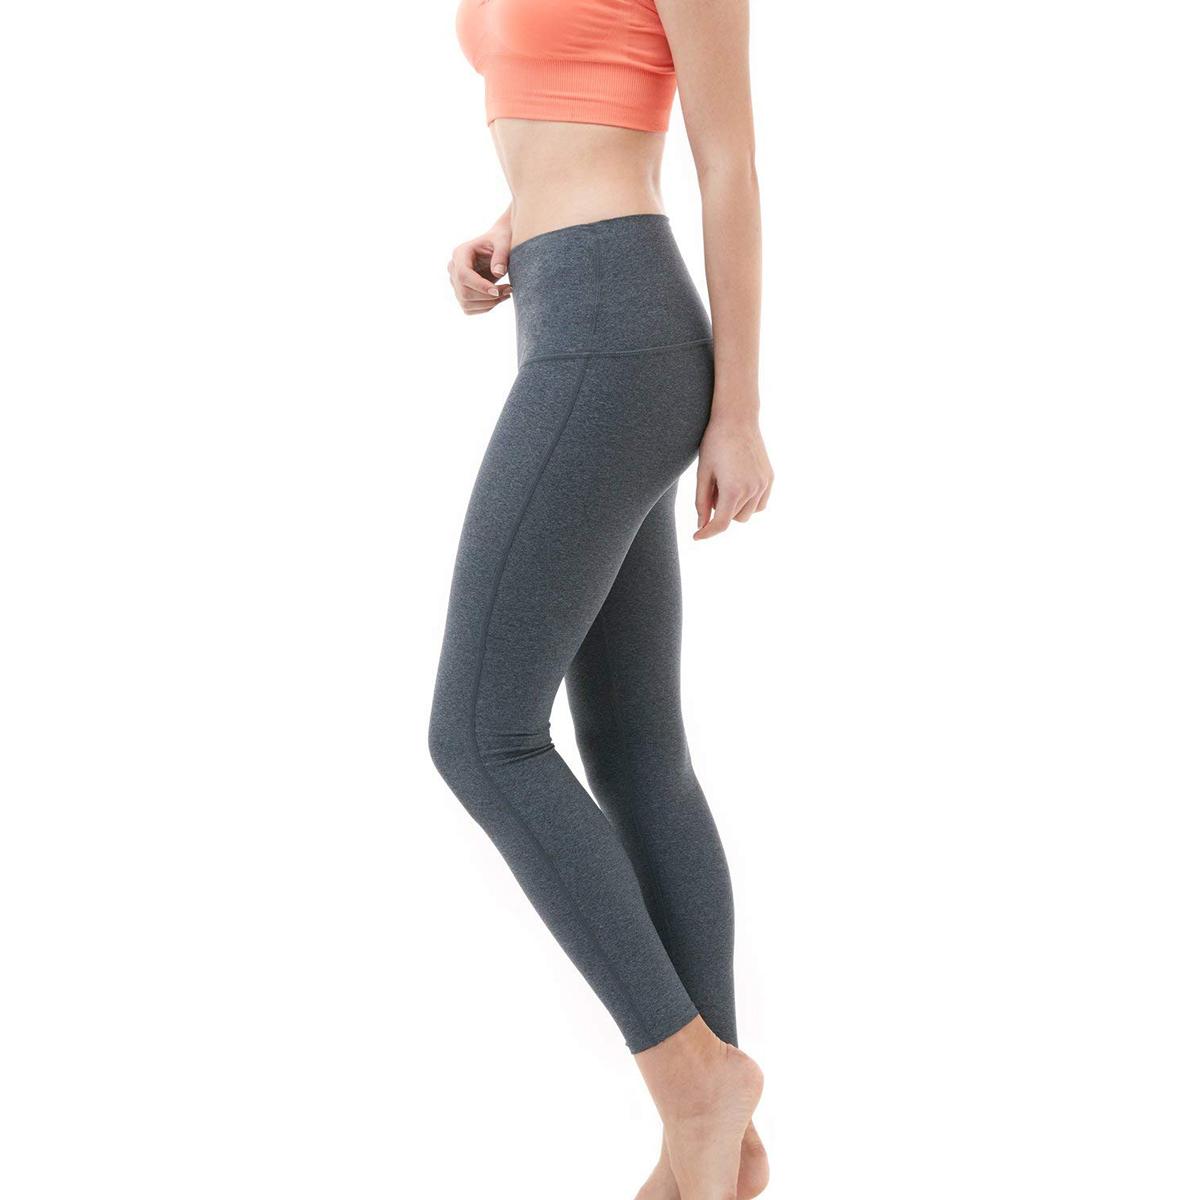 thumbnail 9 - TSLA Tesla FYP52 Women's High-Waisted Ultra-Stretch Tummy Control Yoga Pants